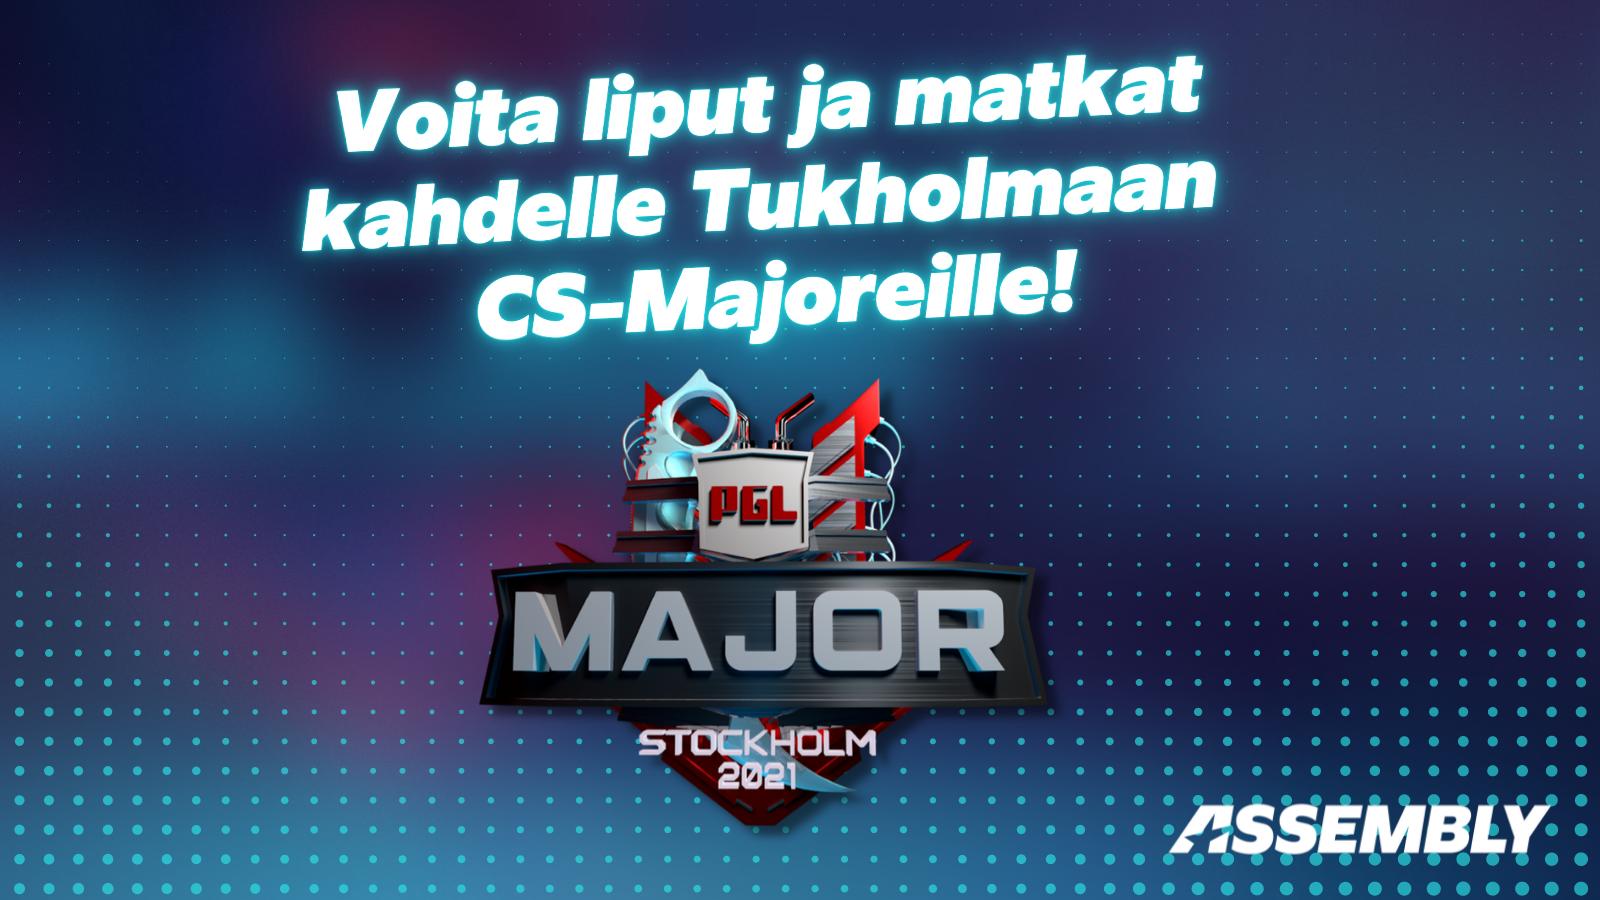 Voita liput Tukholman CS-Majoreille.